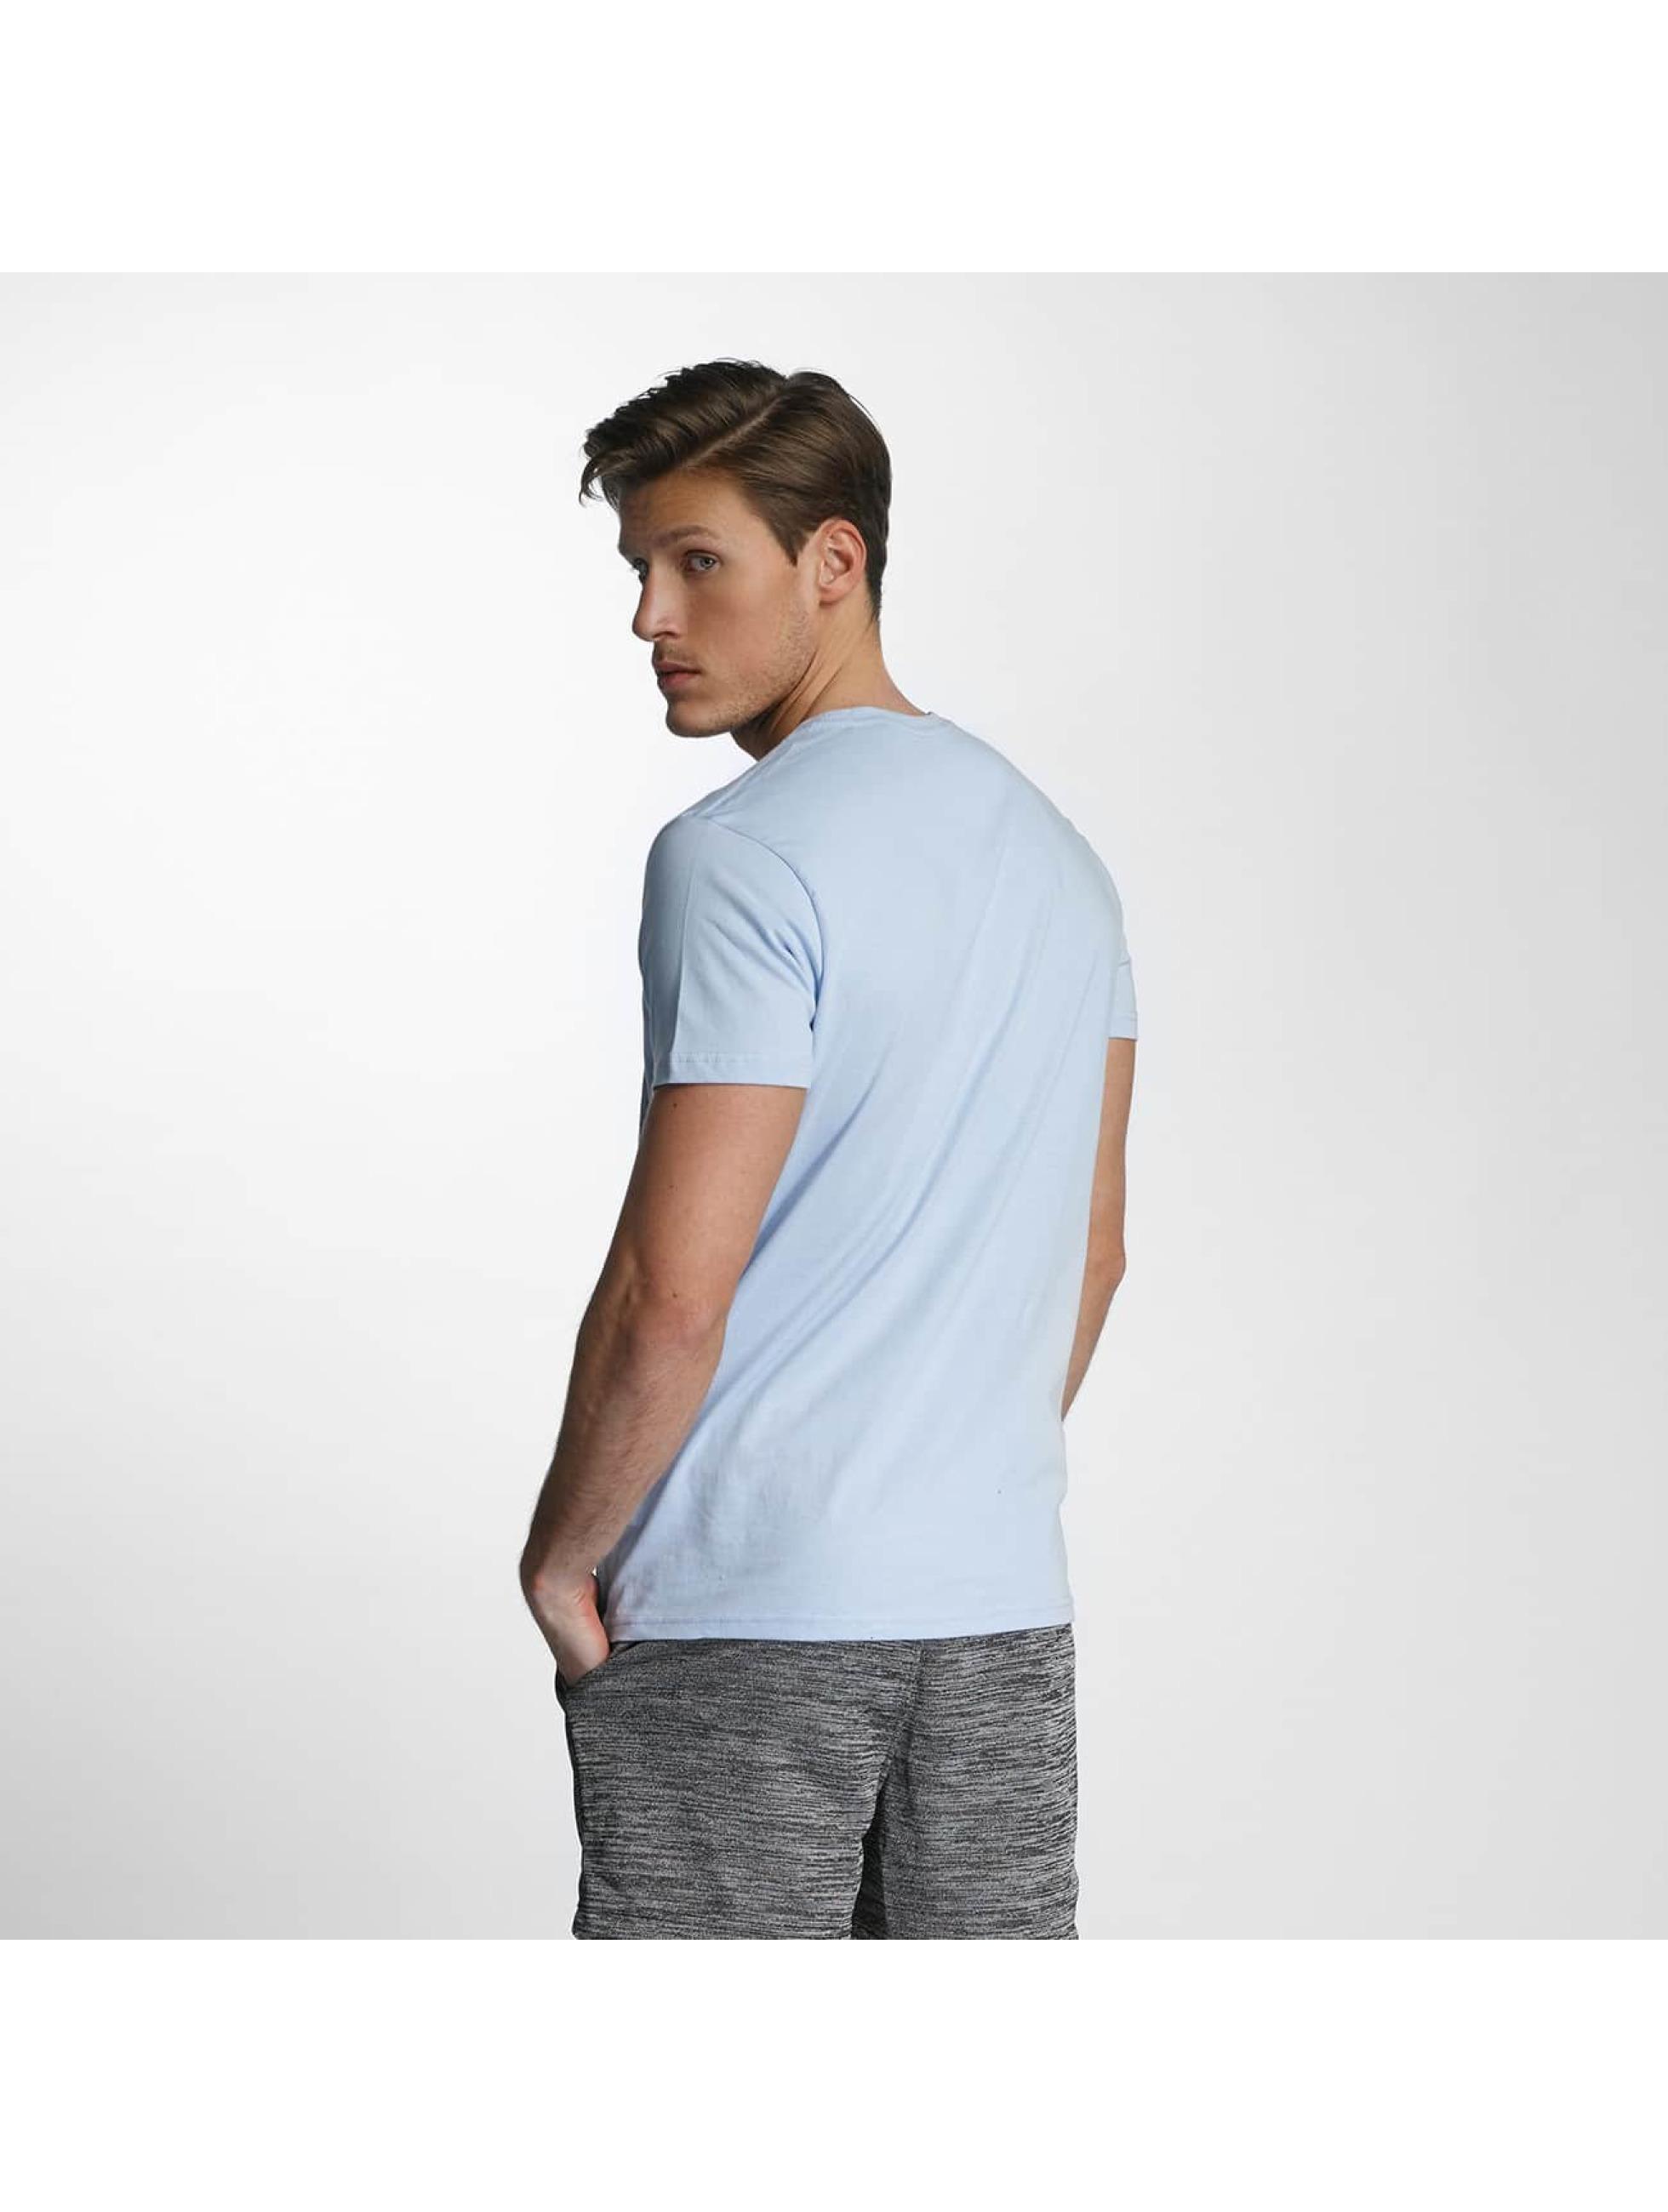 SHINE Original T-Shirt City Lane blue